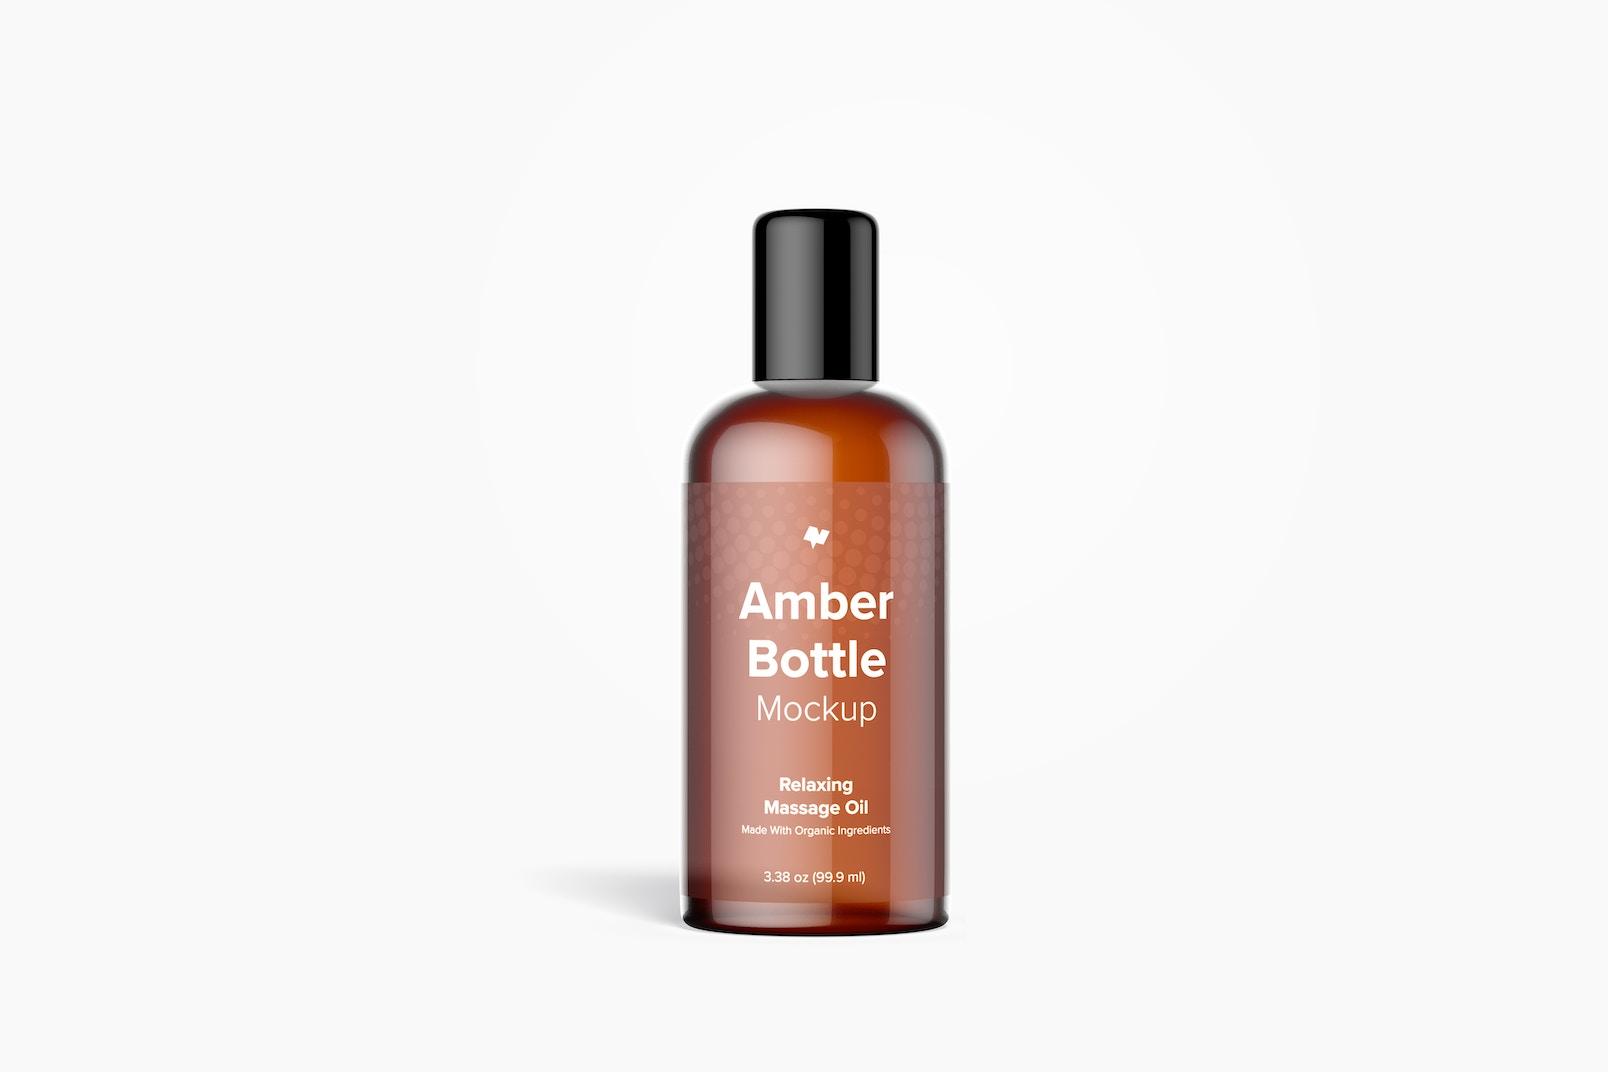 3.38 oz Amber Bottle Mockup, Front View